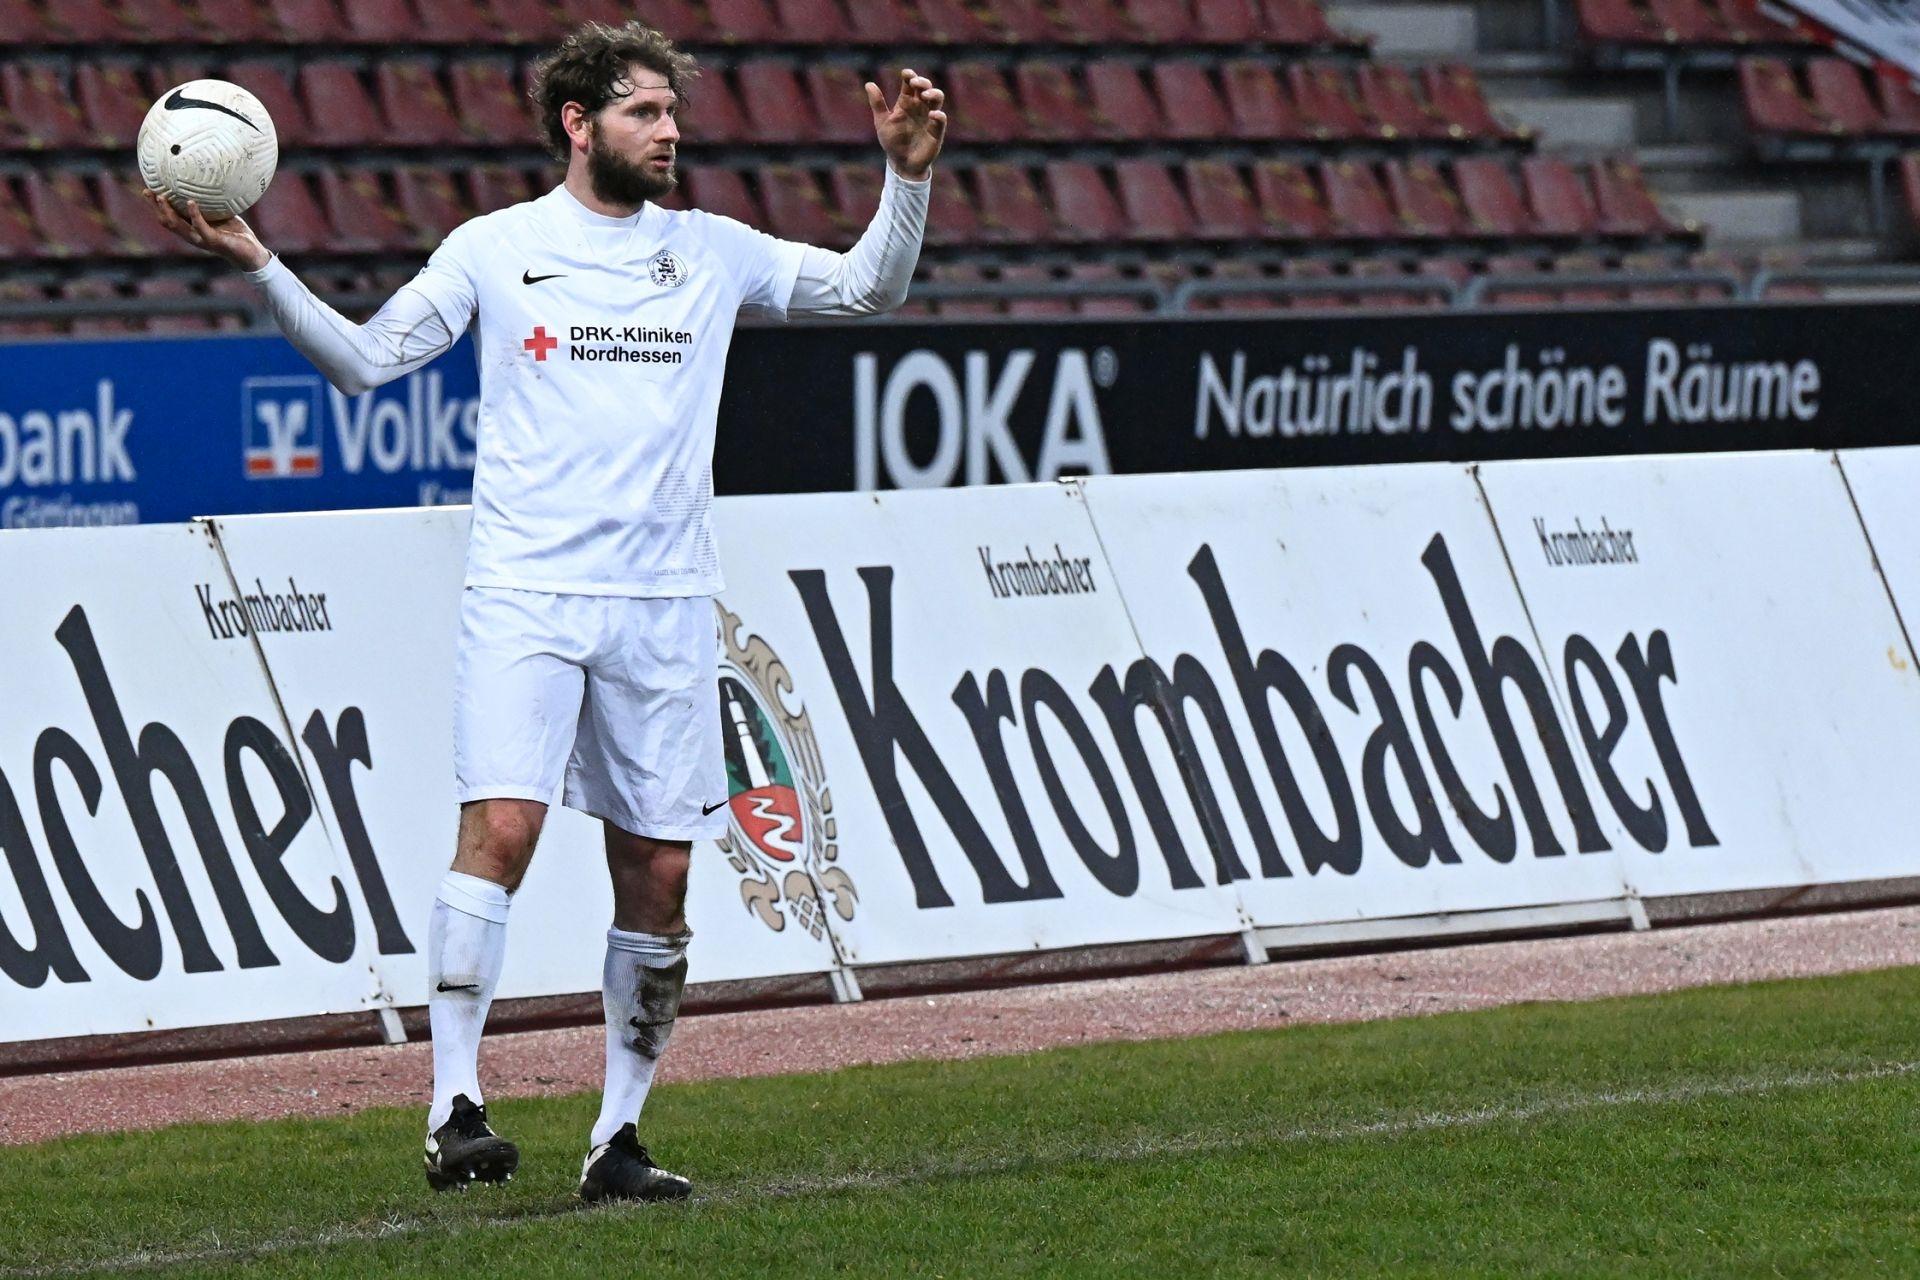 Regionalliga Südwest 2020/21, KSVHessen Kassel, TSV Steinbach Haiger, Endstand 2:1, Ingmar Merle, Krombacher, Joka, Volksbank